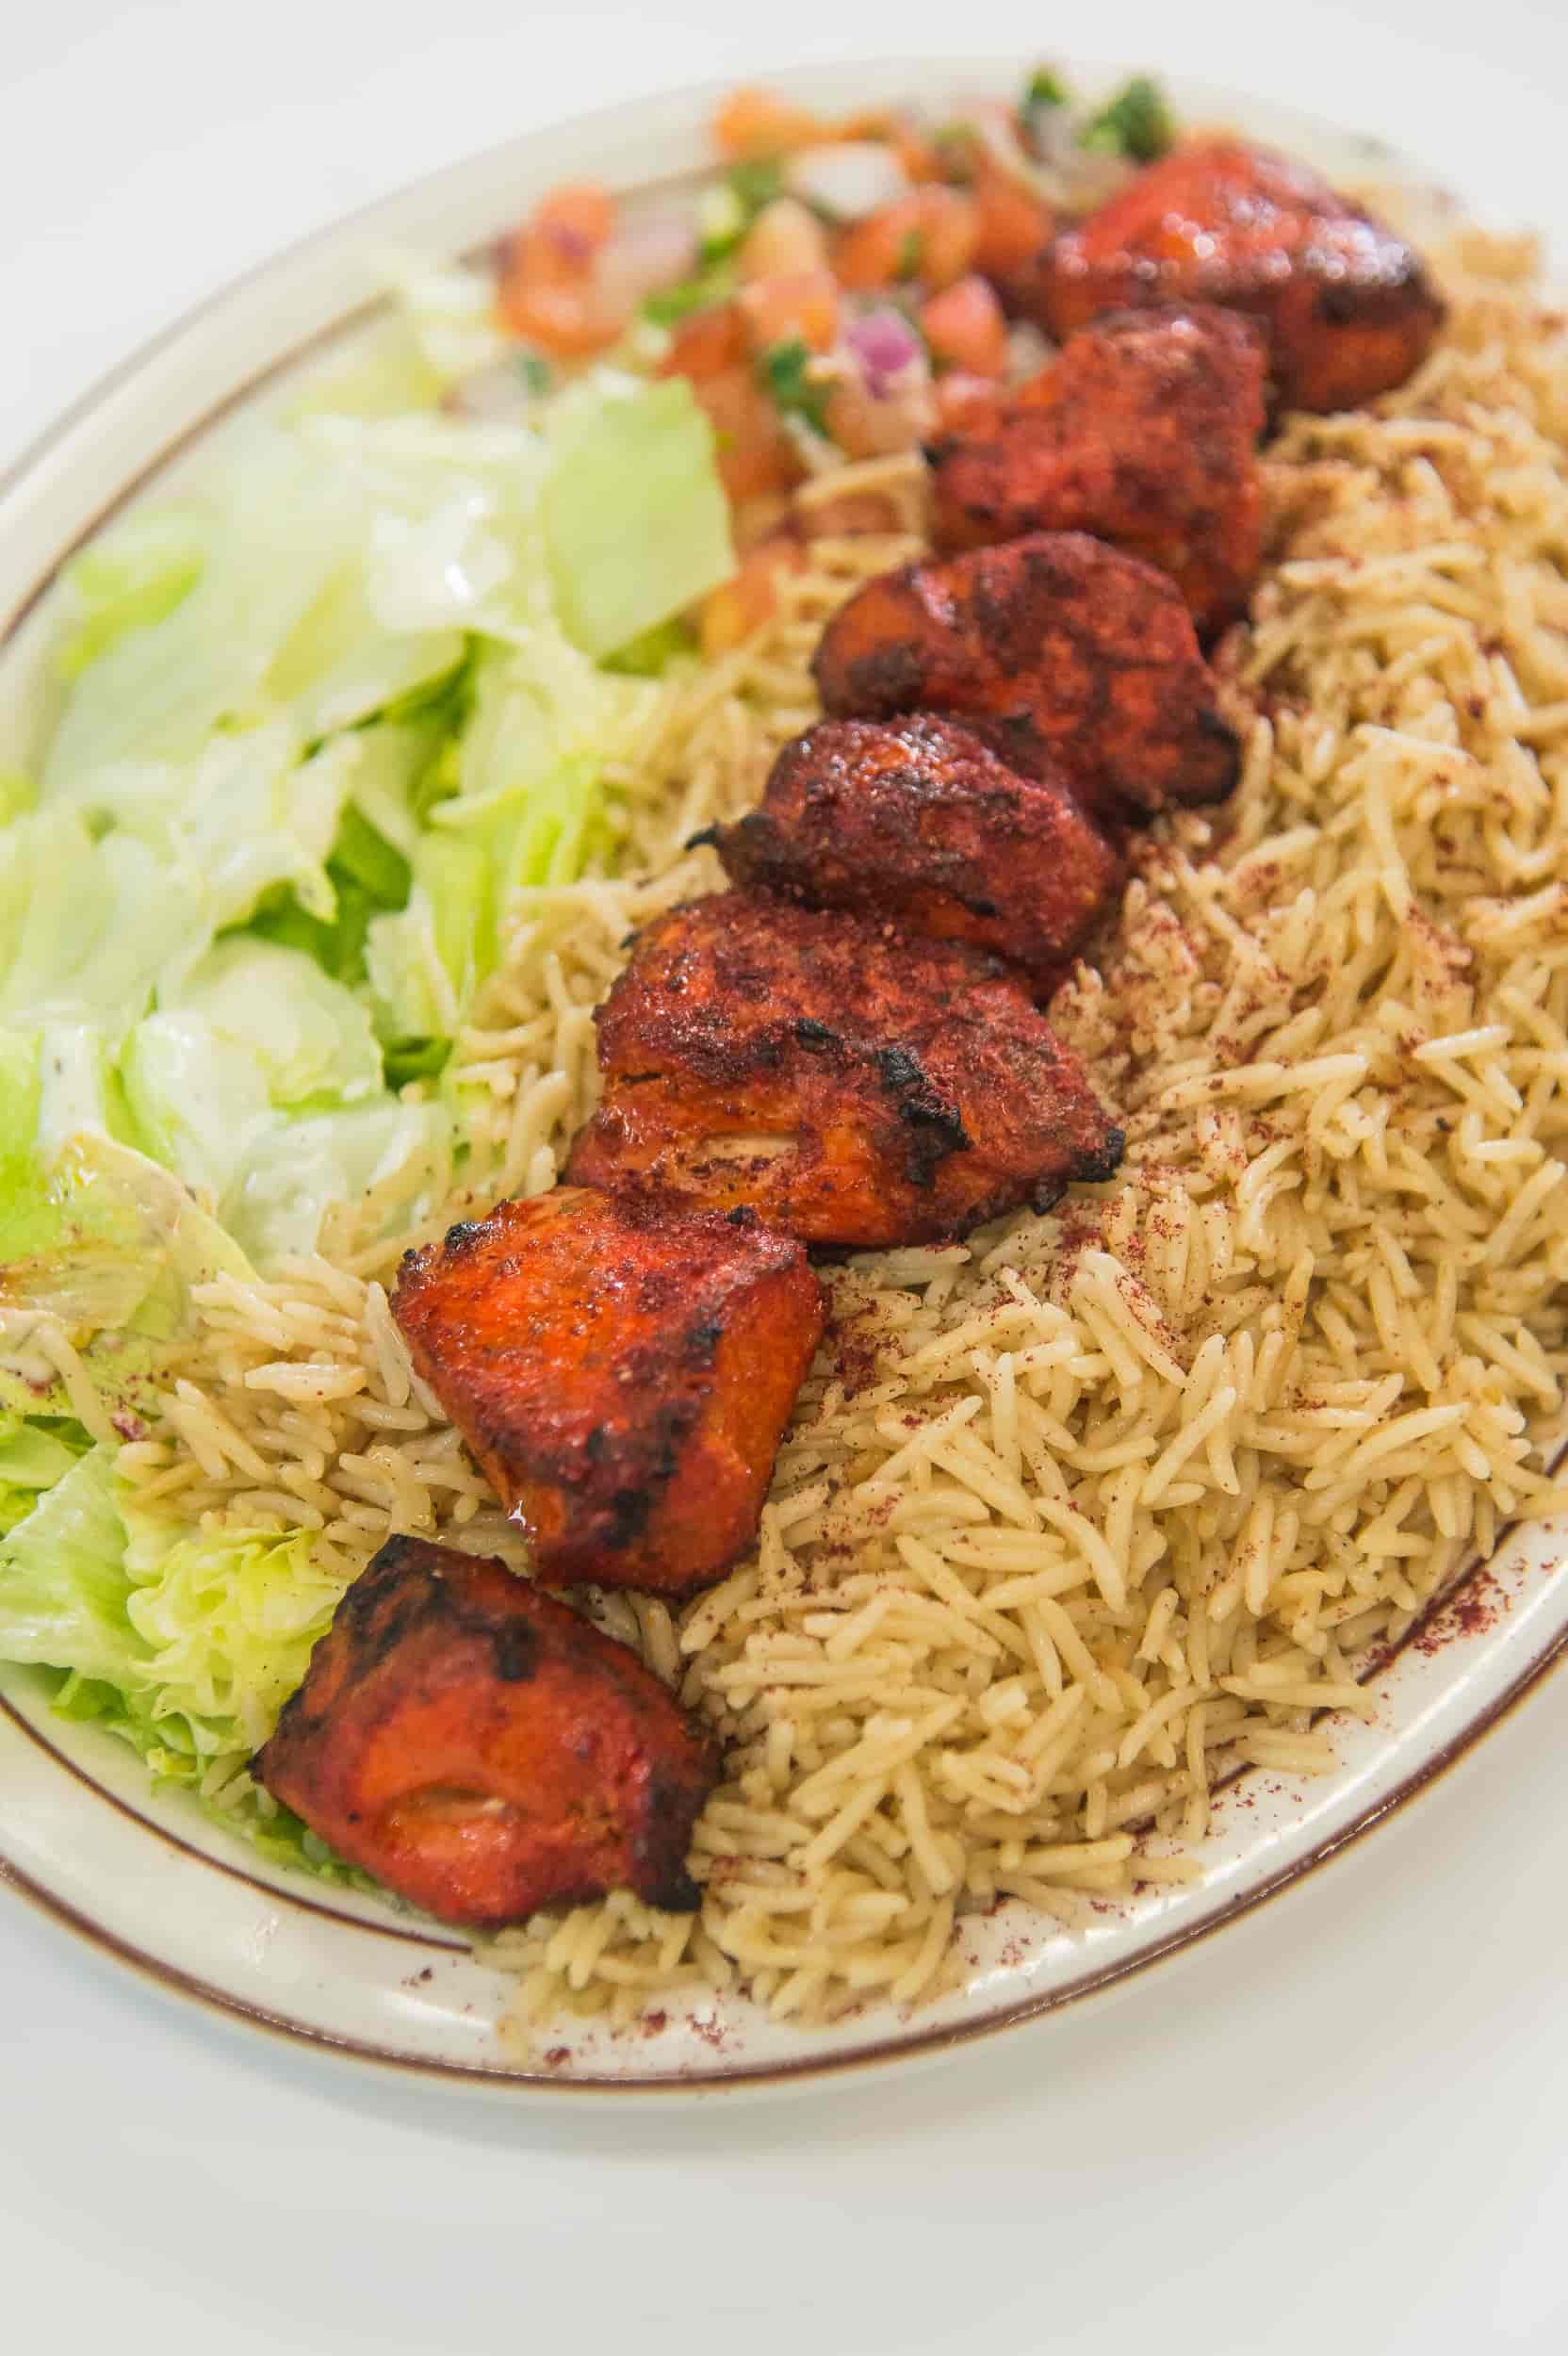 Bamiyan kabob best afghani restaurant in gta tandoori chicken kabob 1349 forumfinder Images